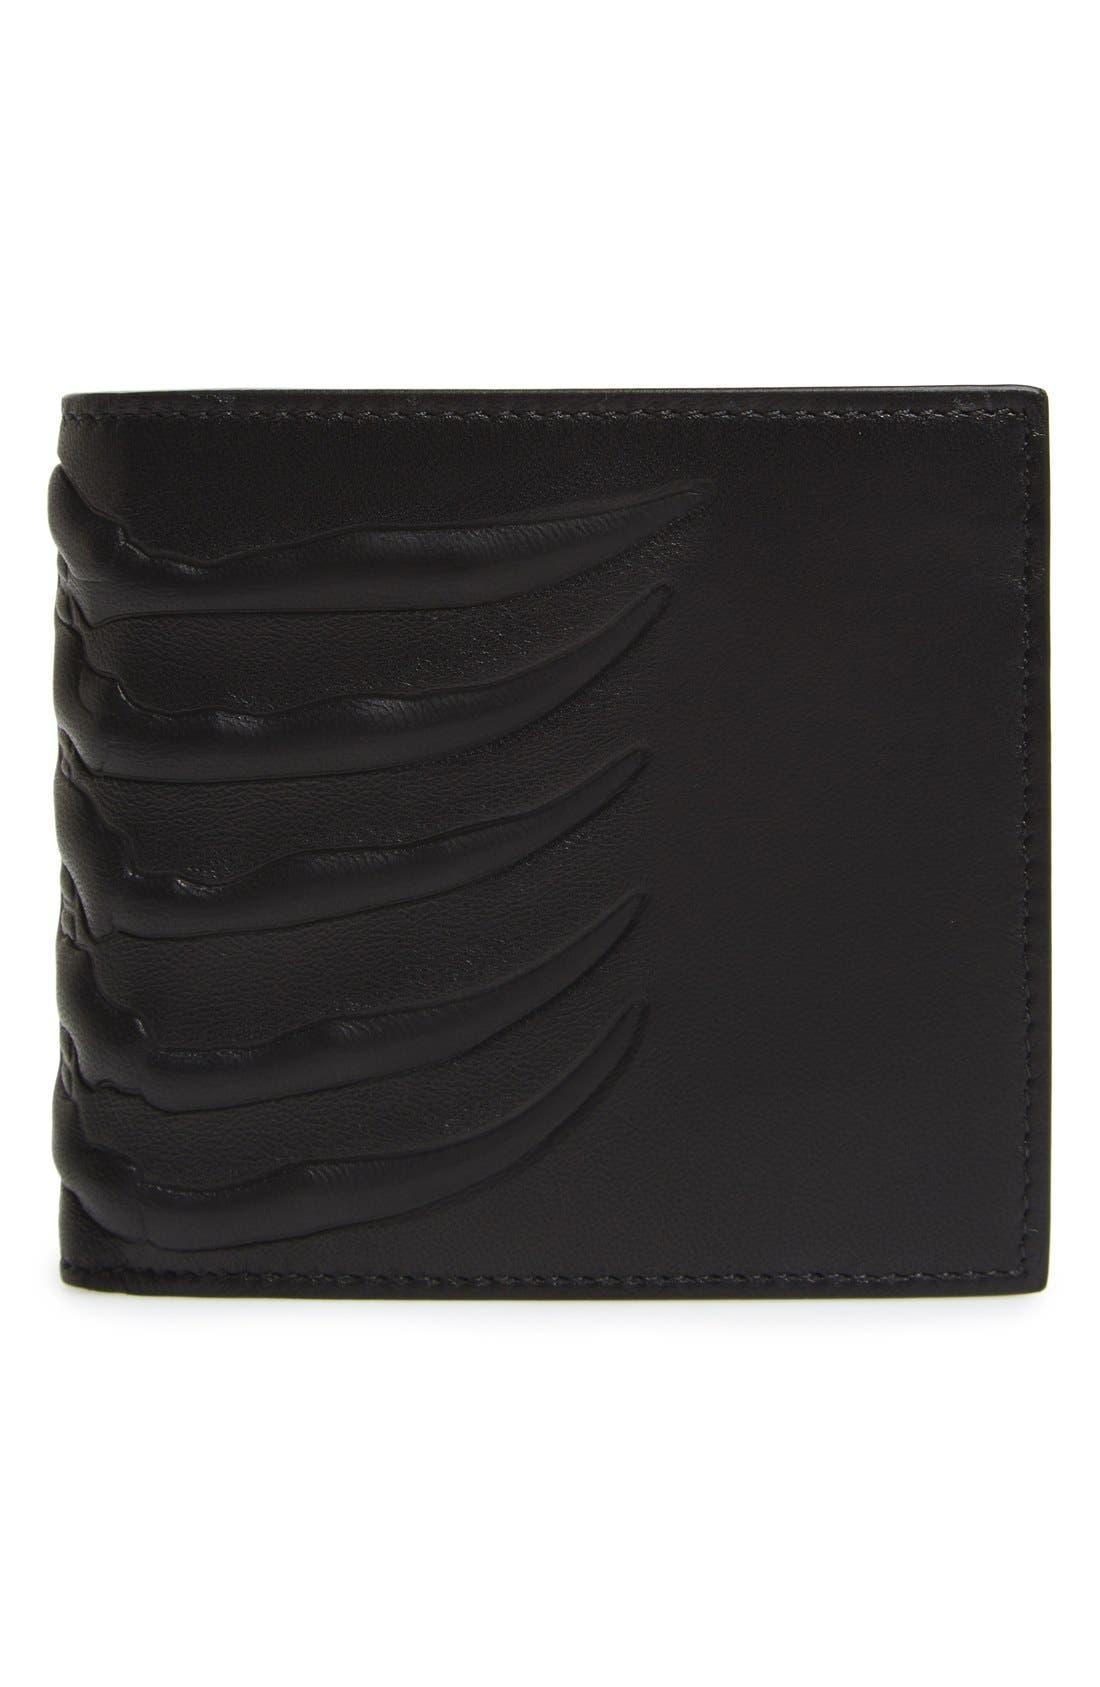 Ribcage Leather Wallet,                             Main thumbnail 1, color,                             Black